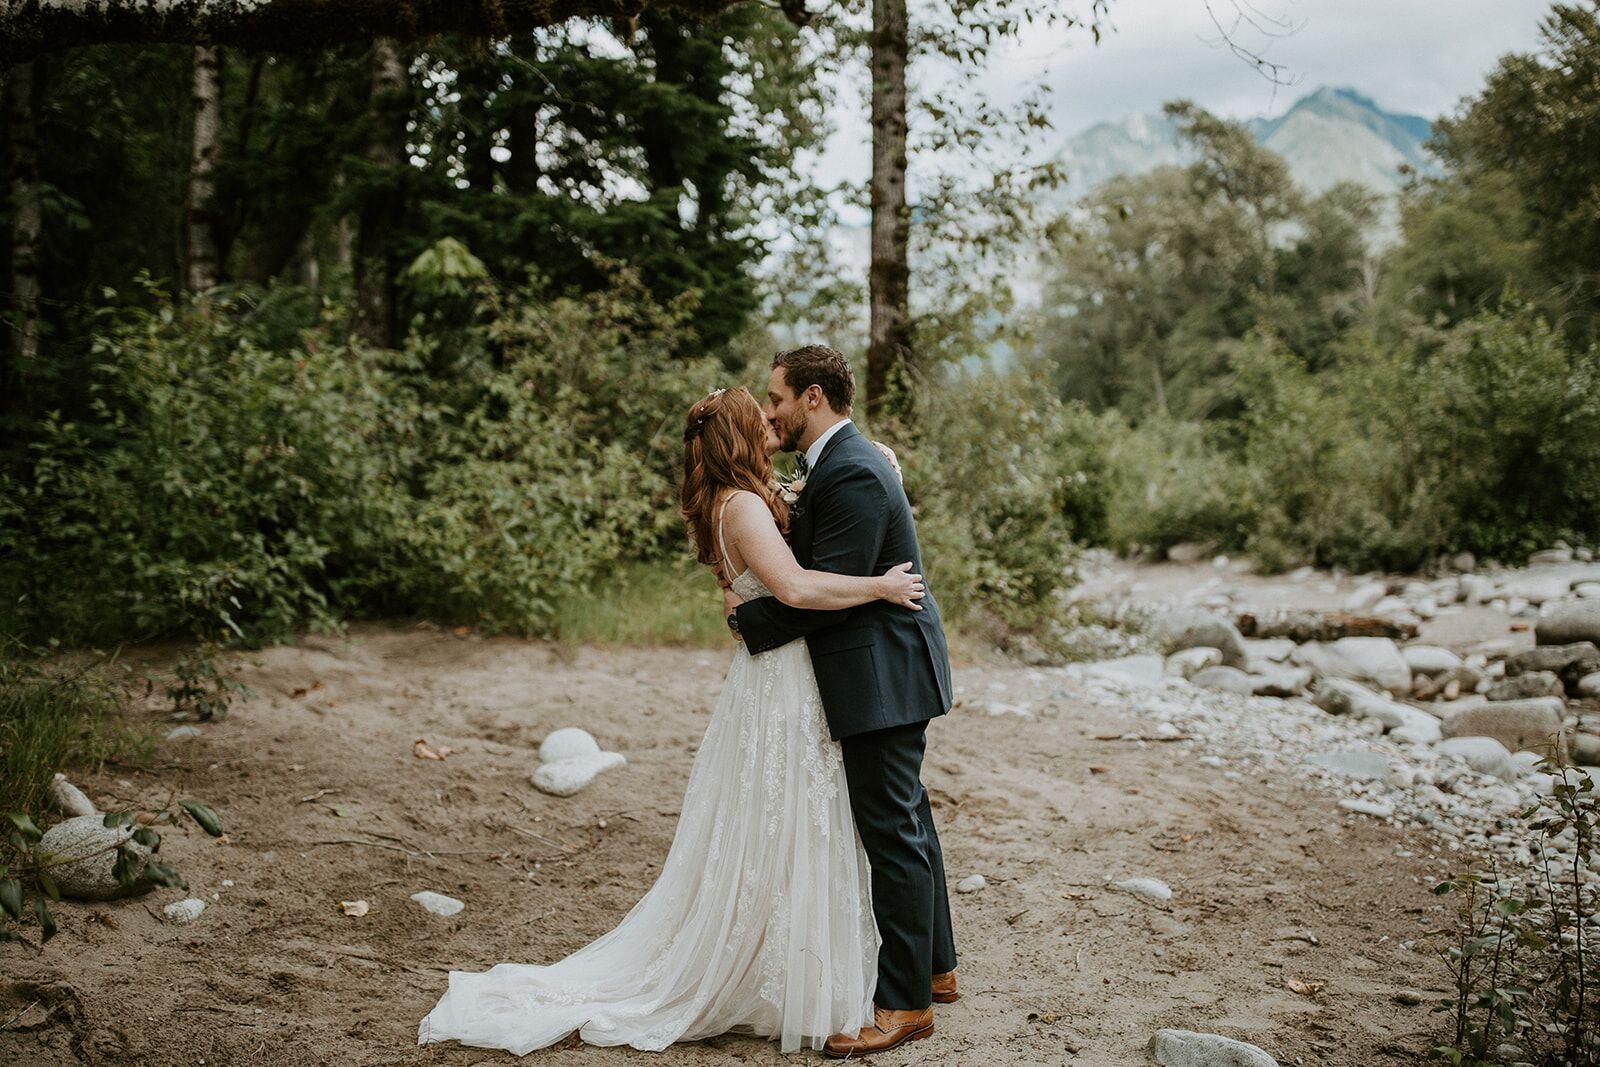 Blue-Sky-Ranch-Wedding-Block-Weddings-and-Events12.jpeg